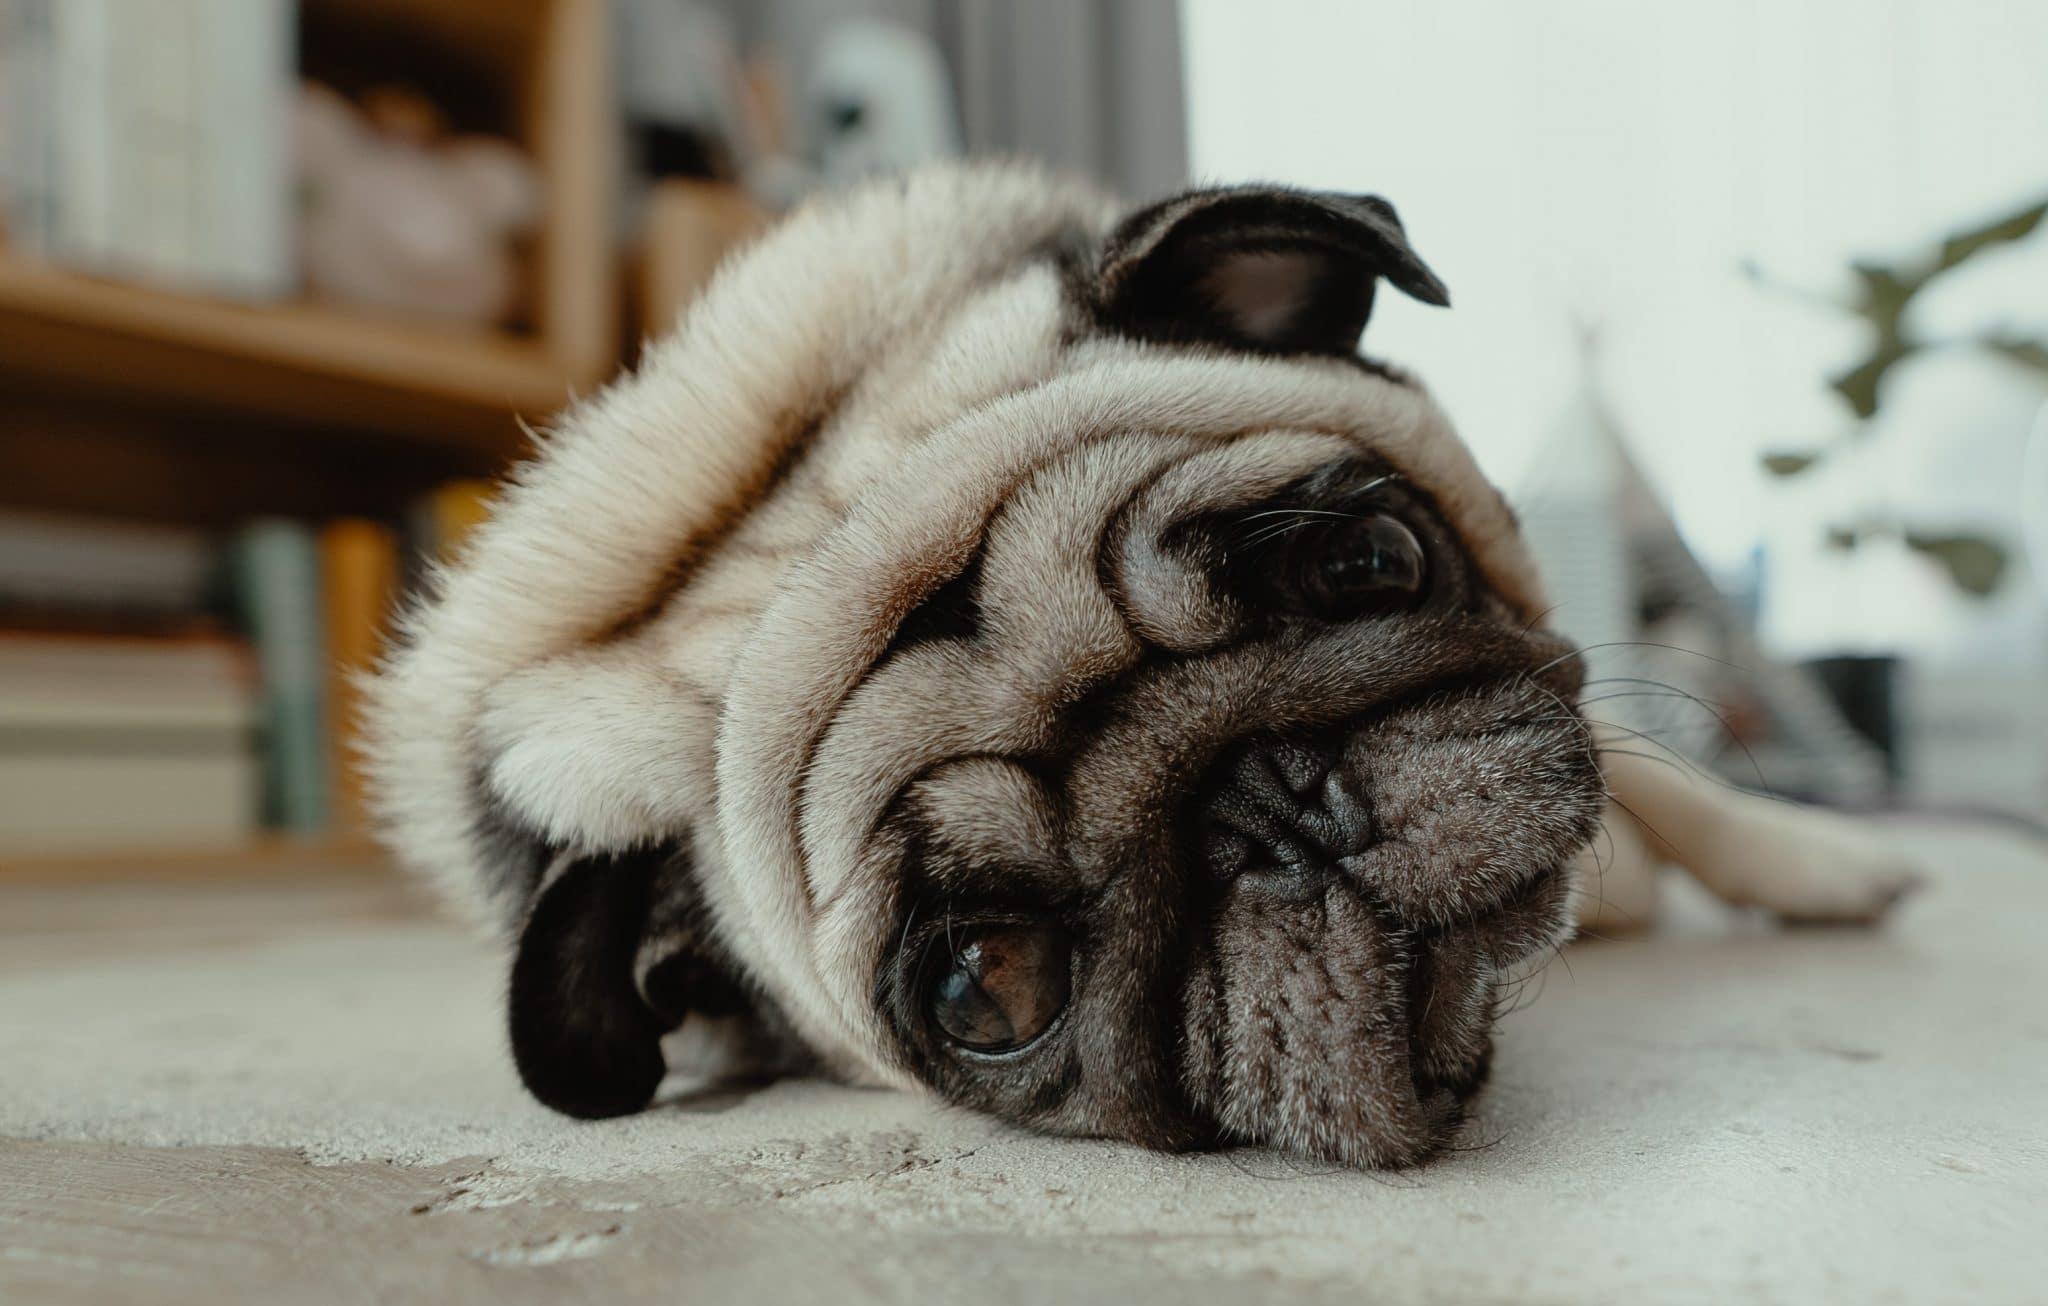 dog stroke wobbly and off balance